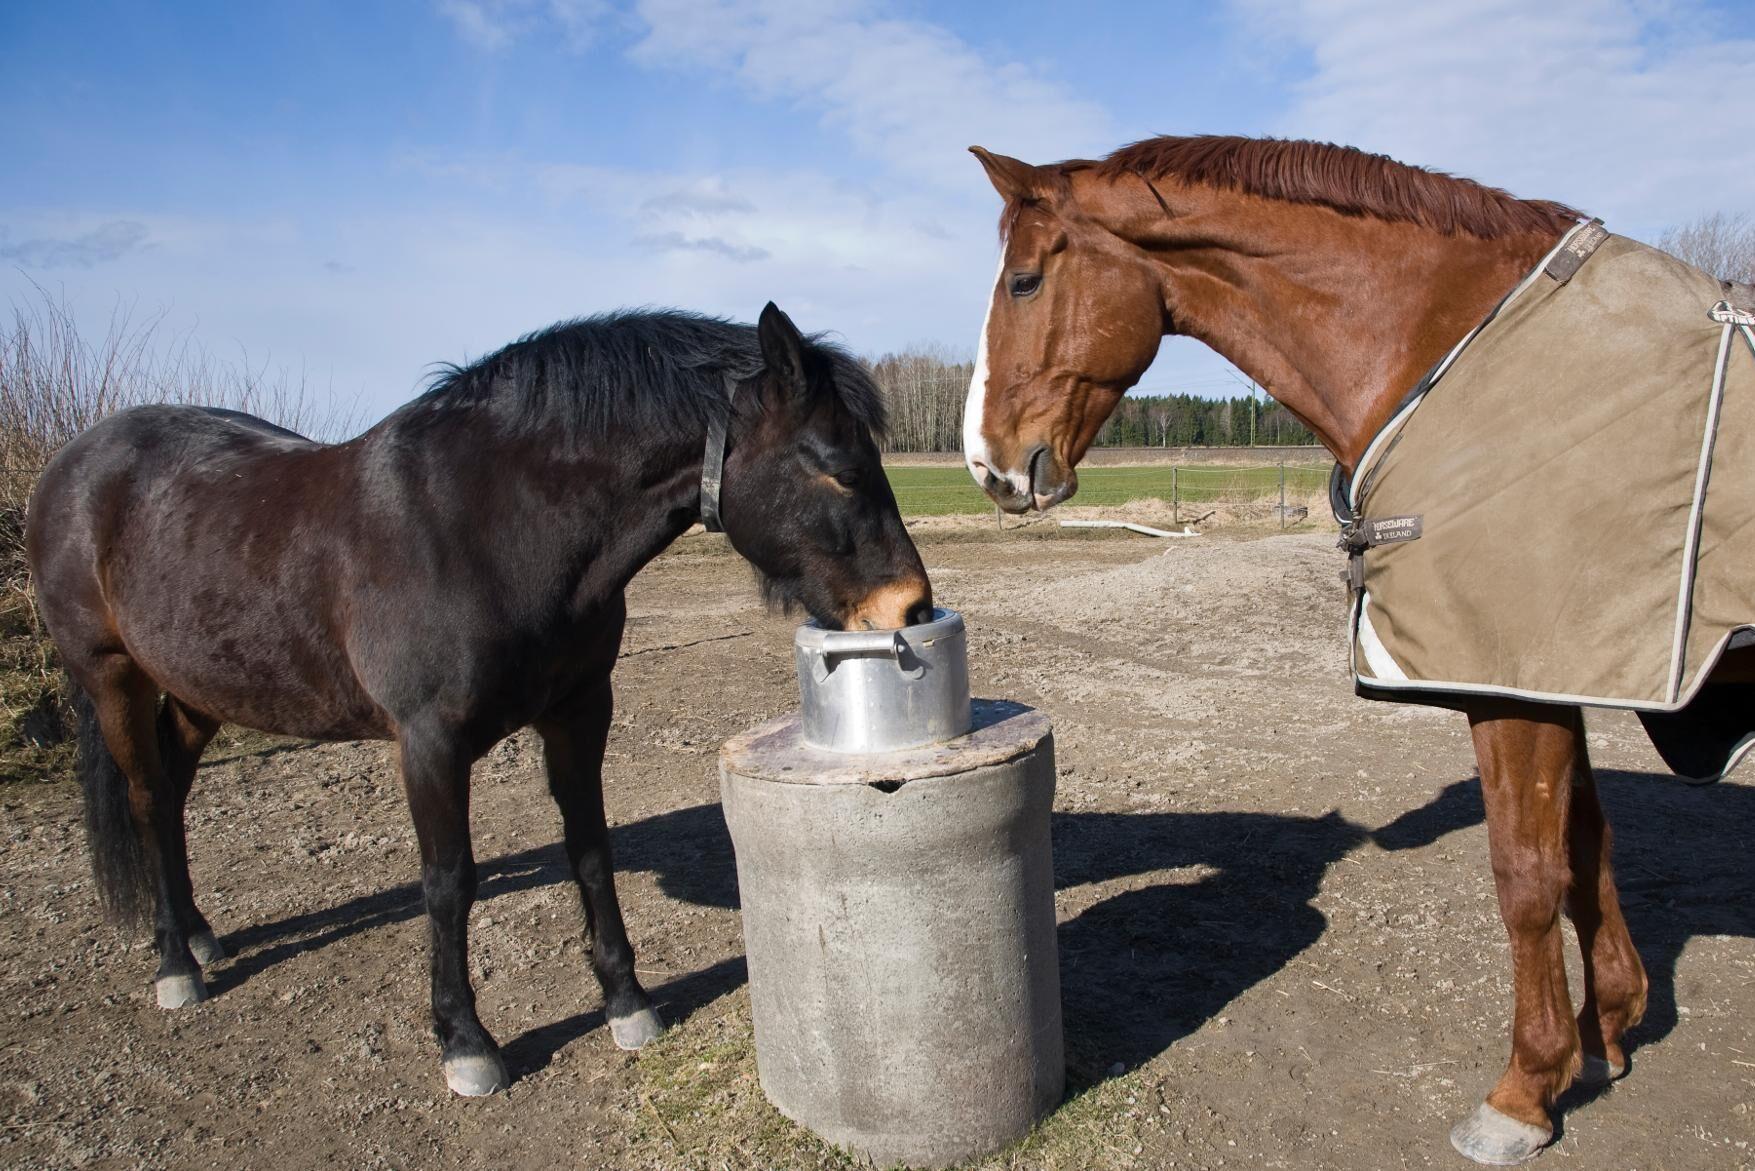 Gödselutredningen har engagerat Hästsverige under sommaren.